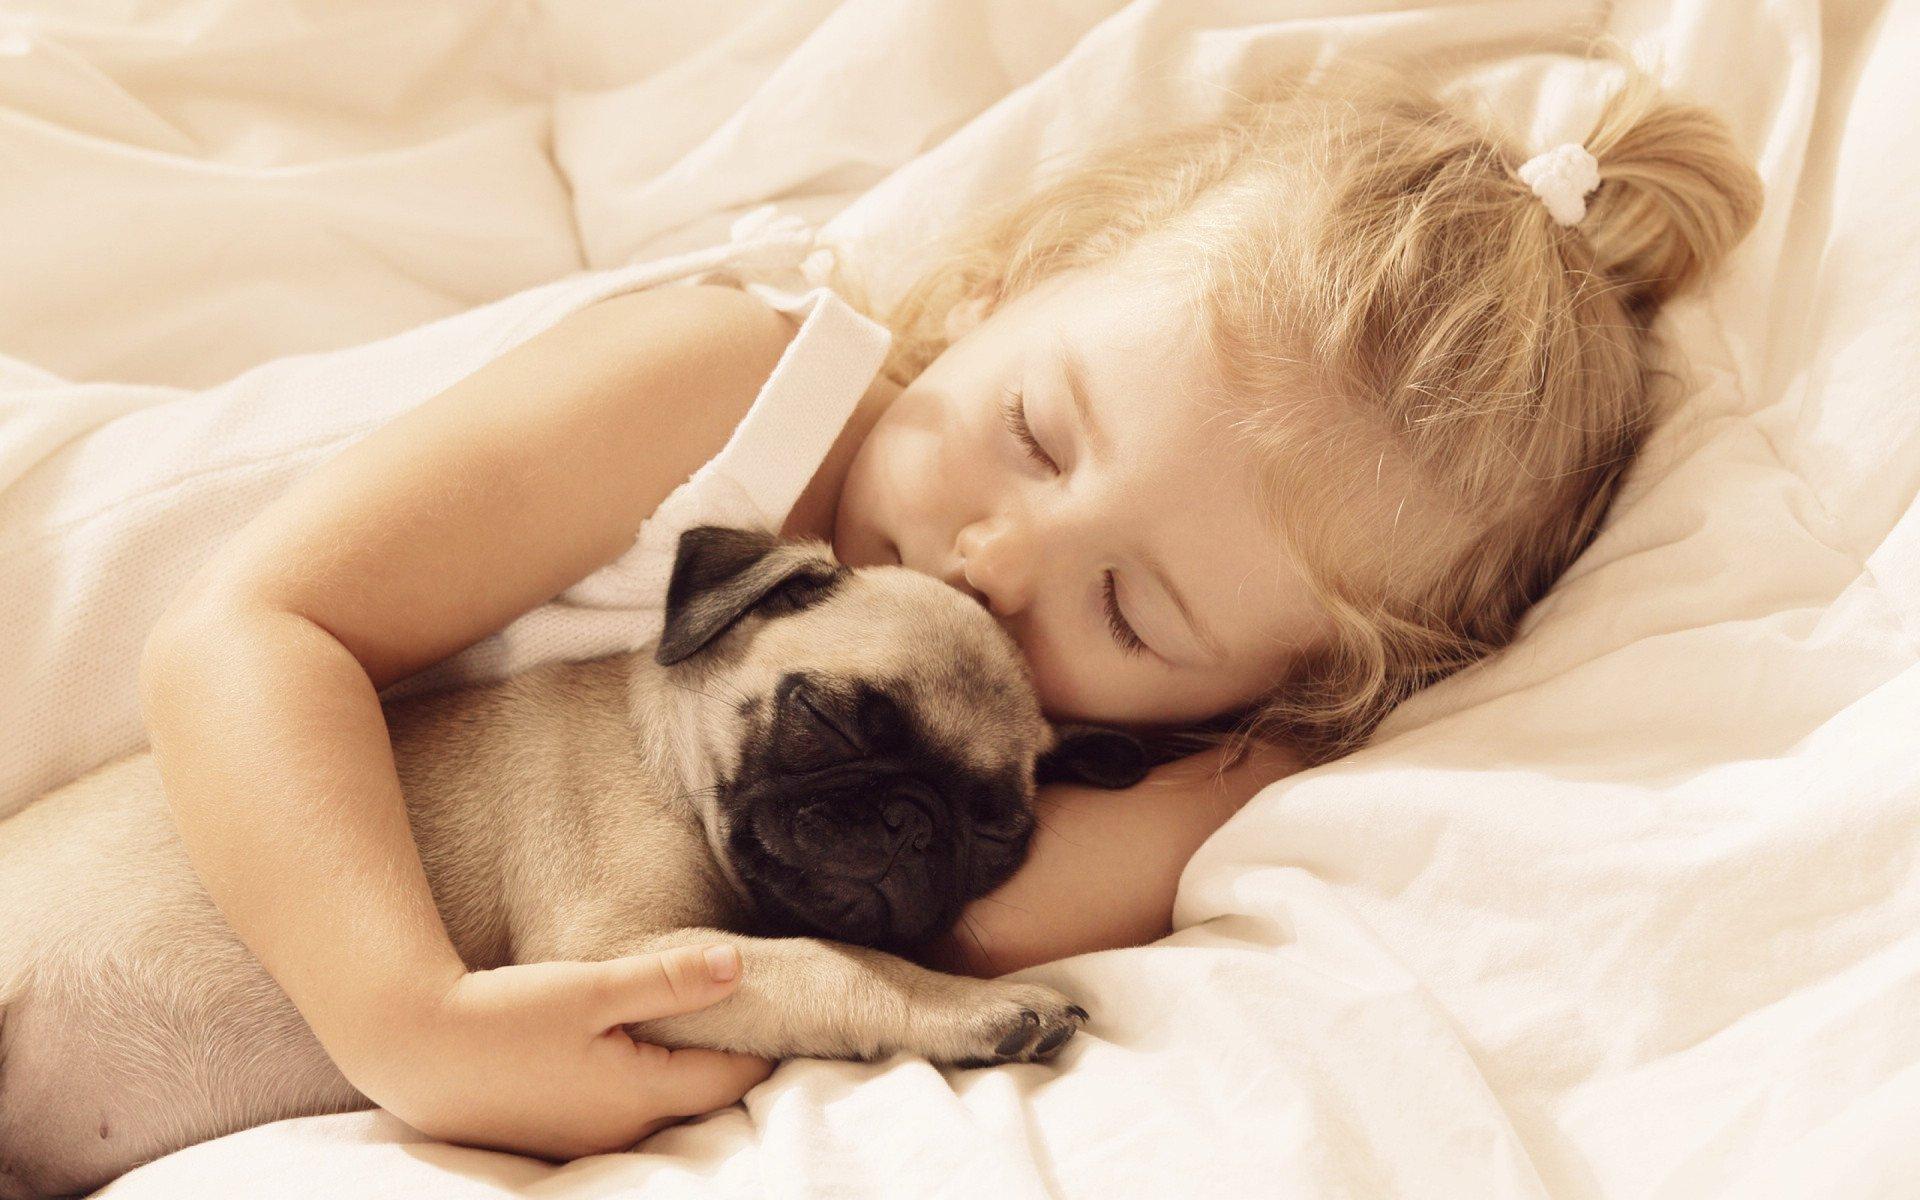 Baby Girl And Boy Wallpaper Baby Cute Girl Blonde Animal Dog Sleepy Angel Children